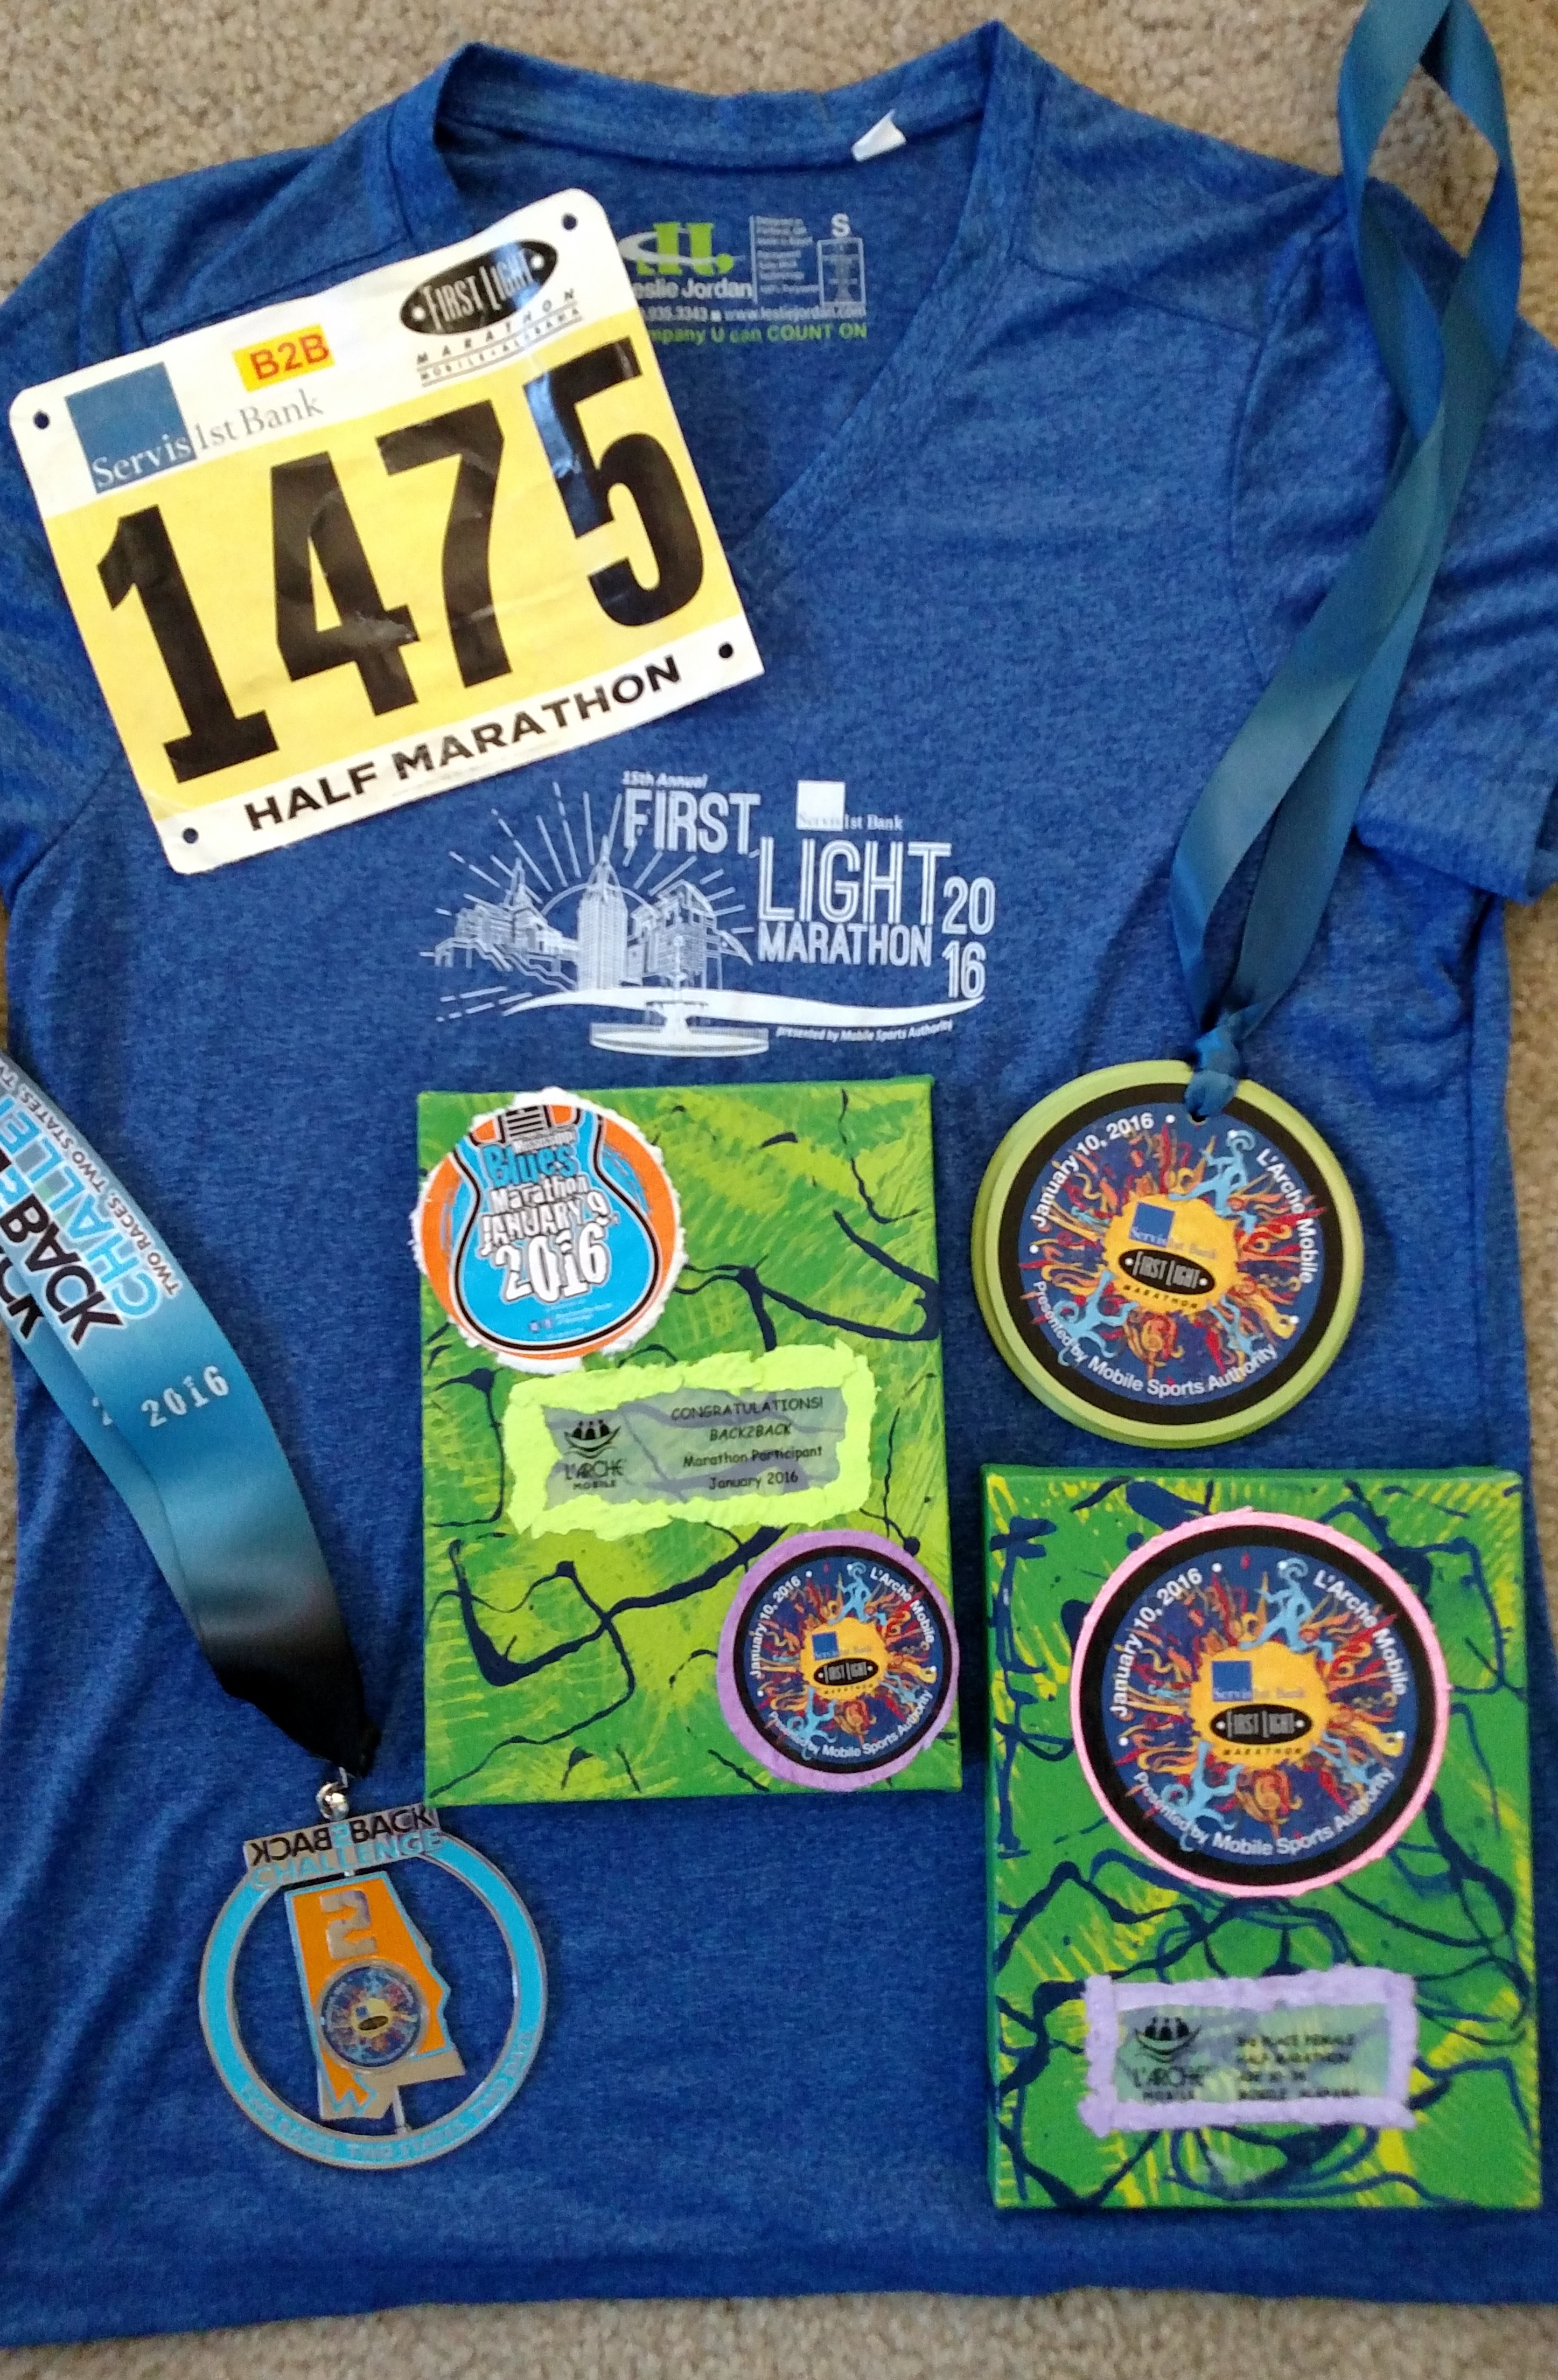 I Continued To First Light Half Marathon